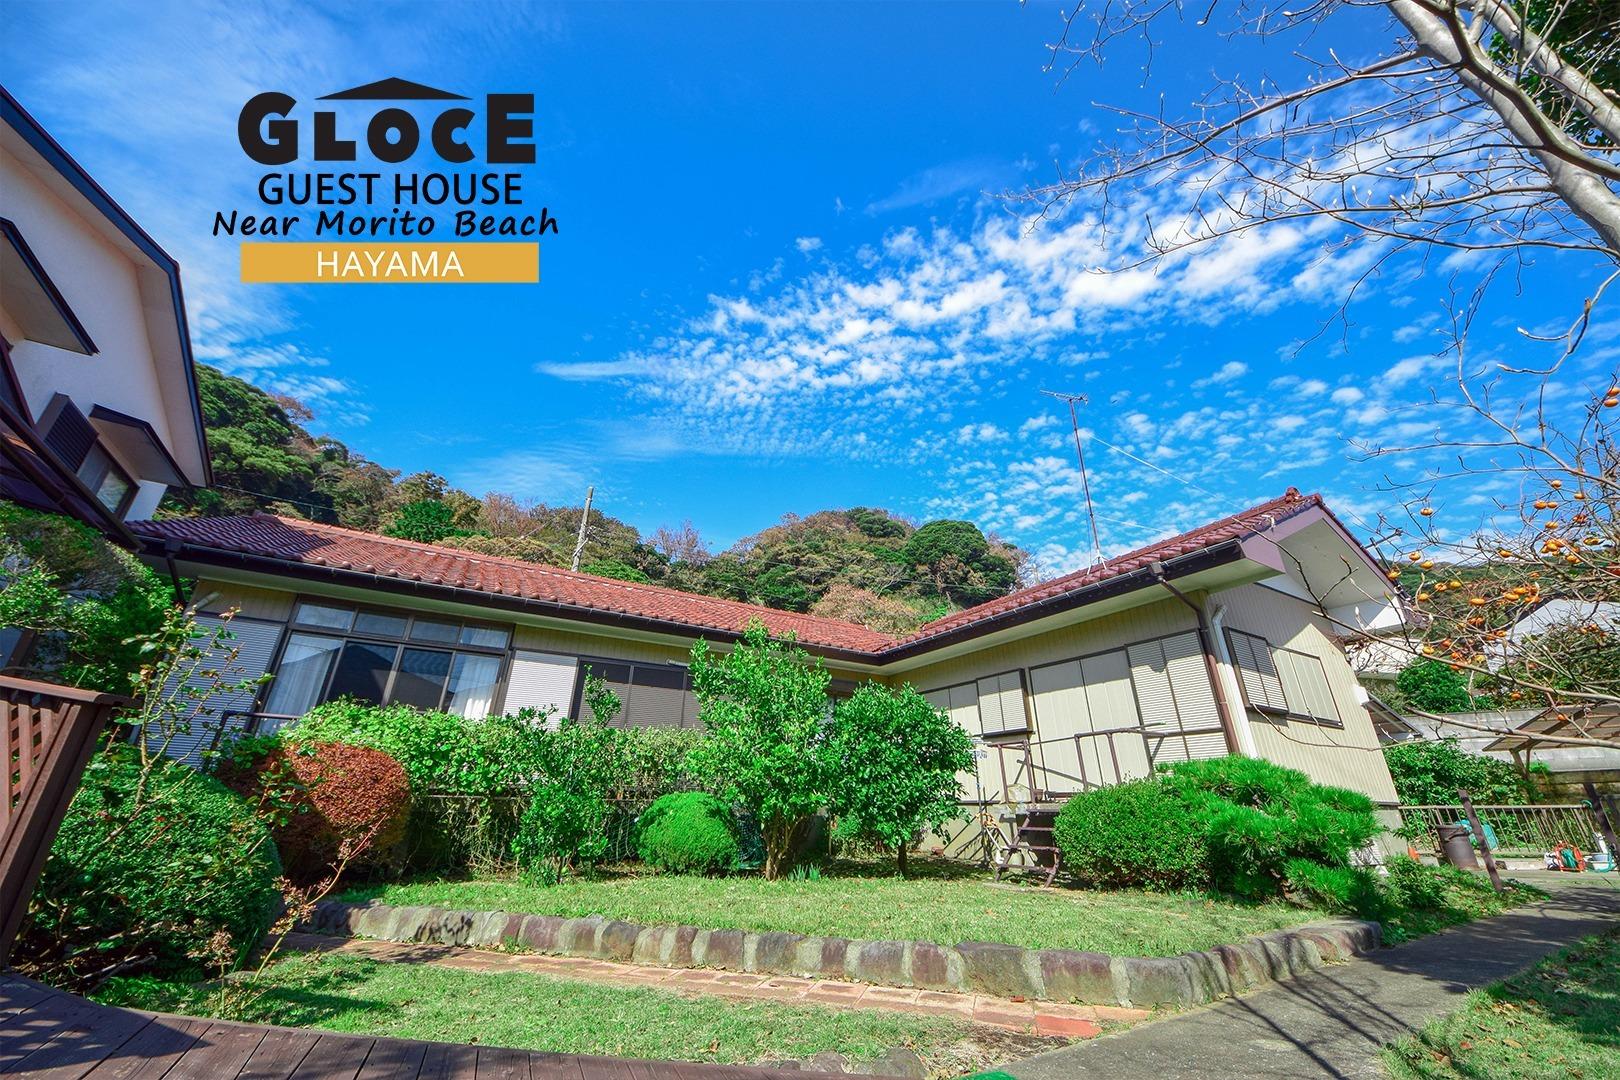 GLOCE Hayama near Morito Beach ご家族連れには最適なゲストハウスです!